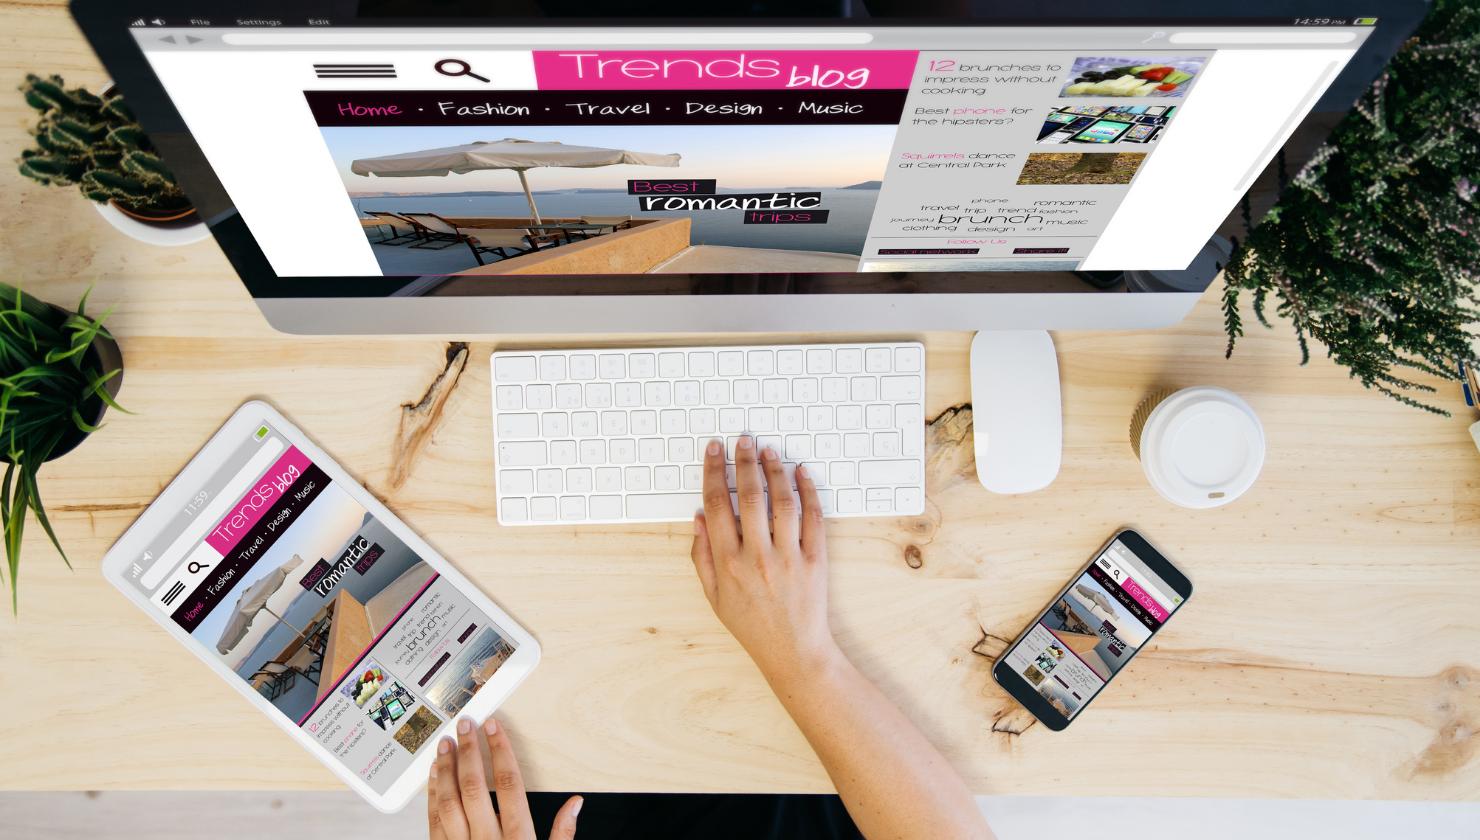 Website Investment Tips from Successful Digital Entrepreneur Eric Porat: Part 2